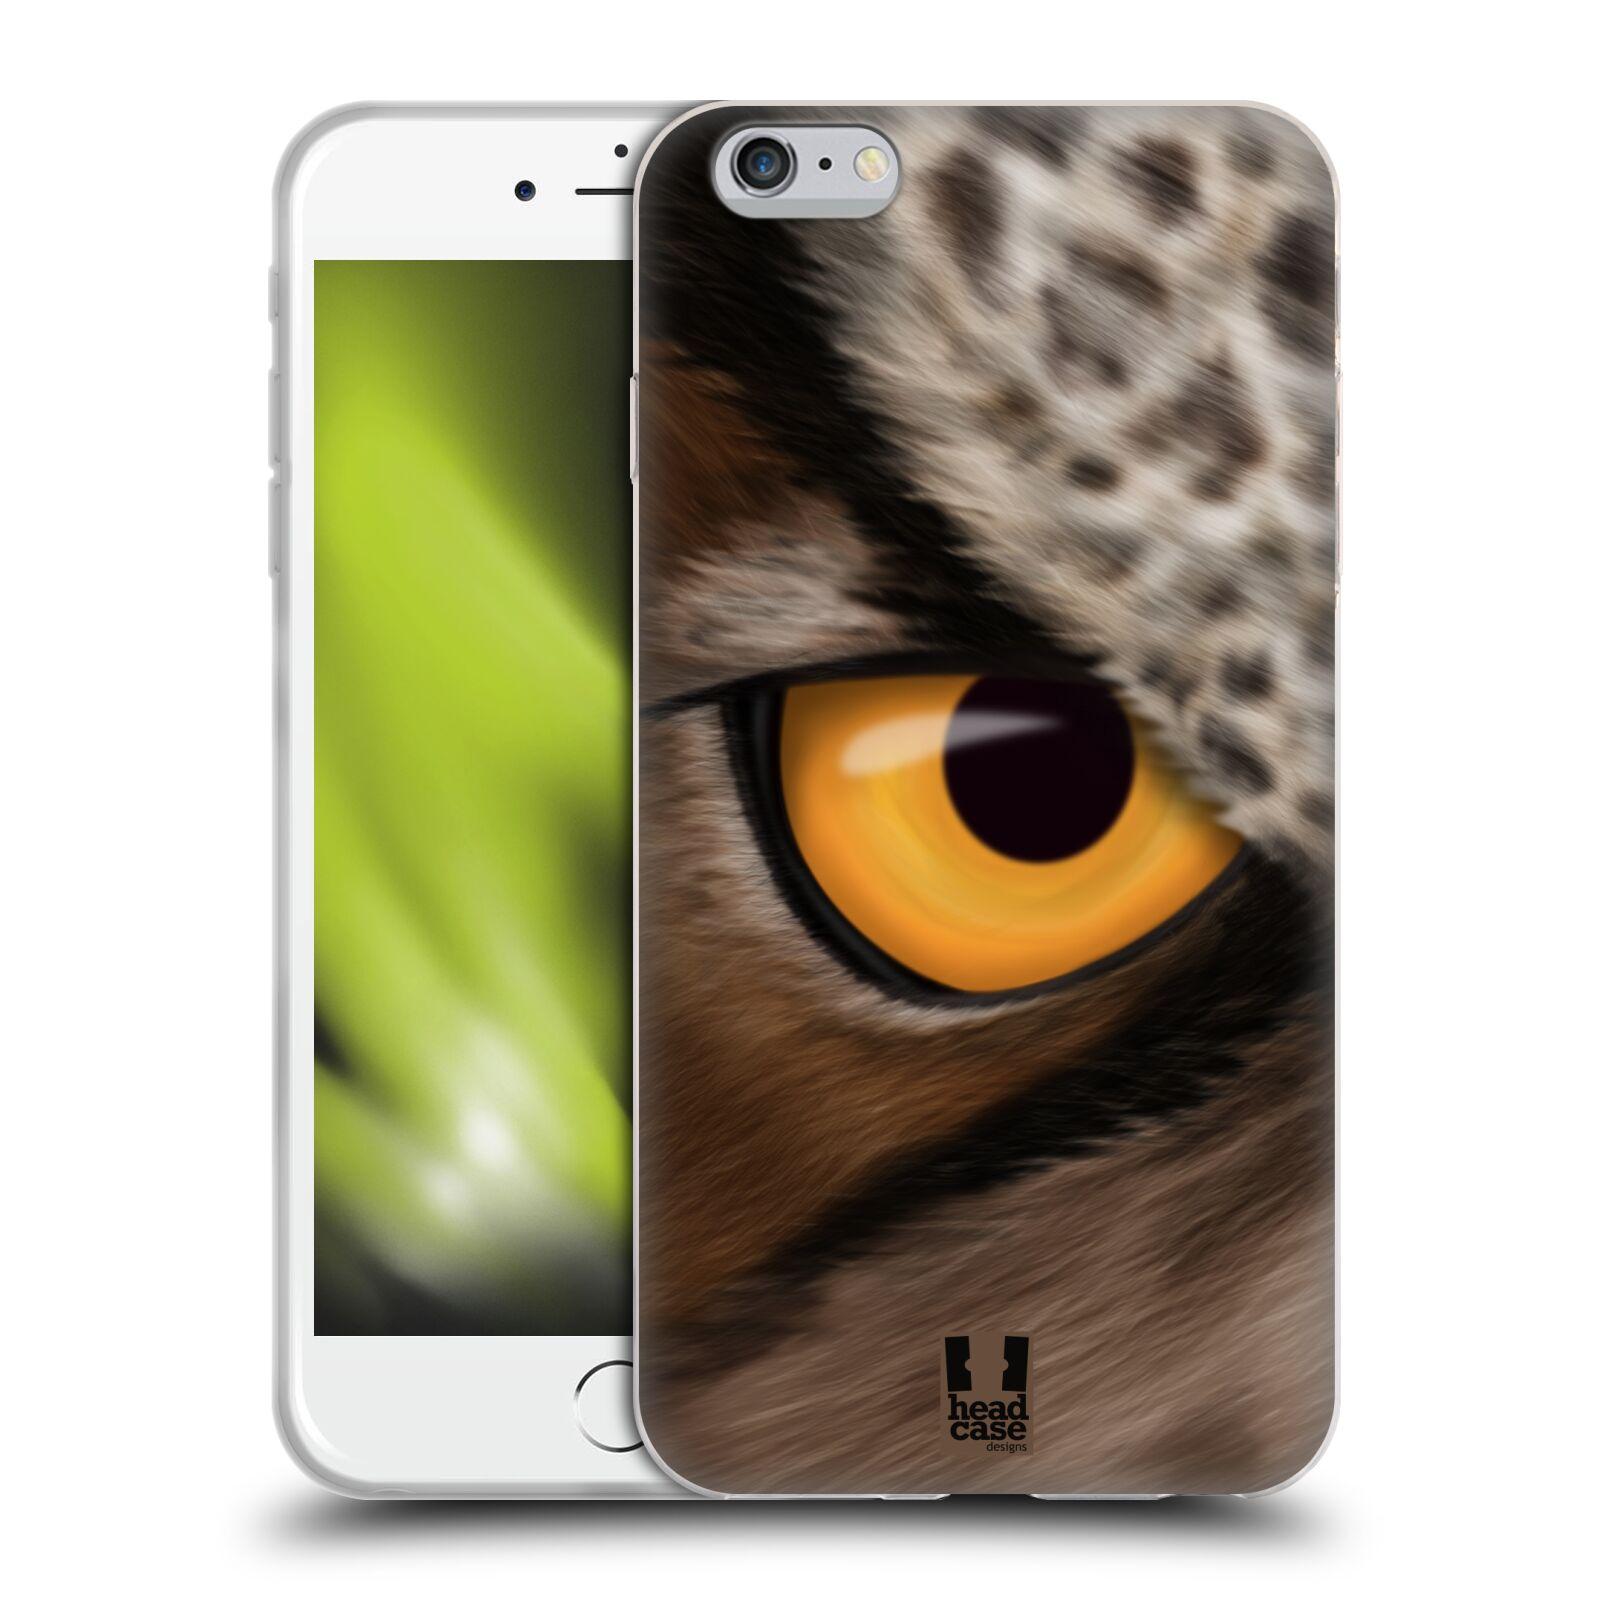 HEAD CASE silikonový obal na mobil Apple Iphone 6 PLUS/ 6S PLUS vzor pohled zvířete oko sova